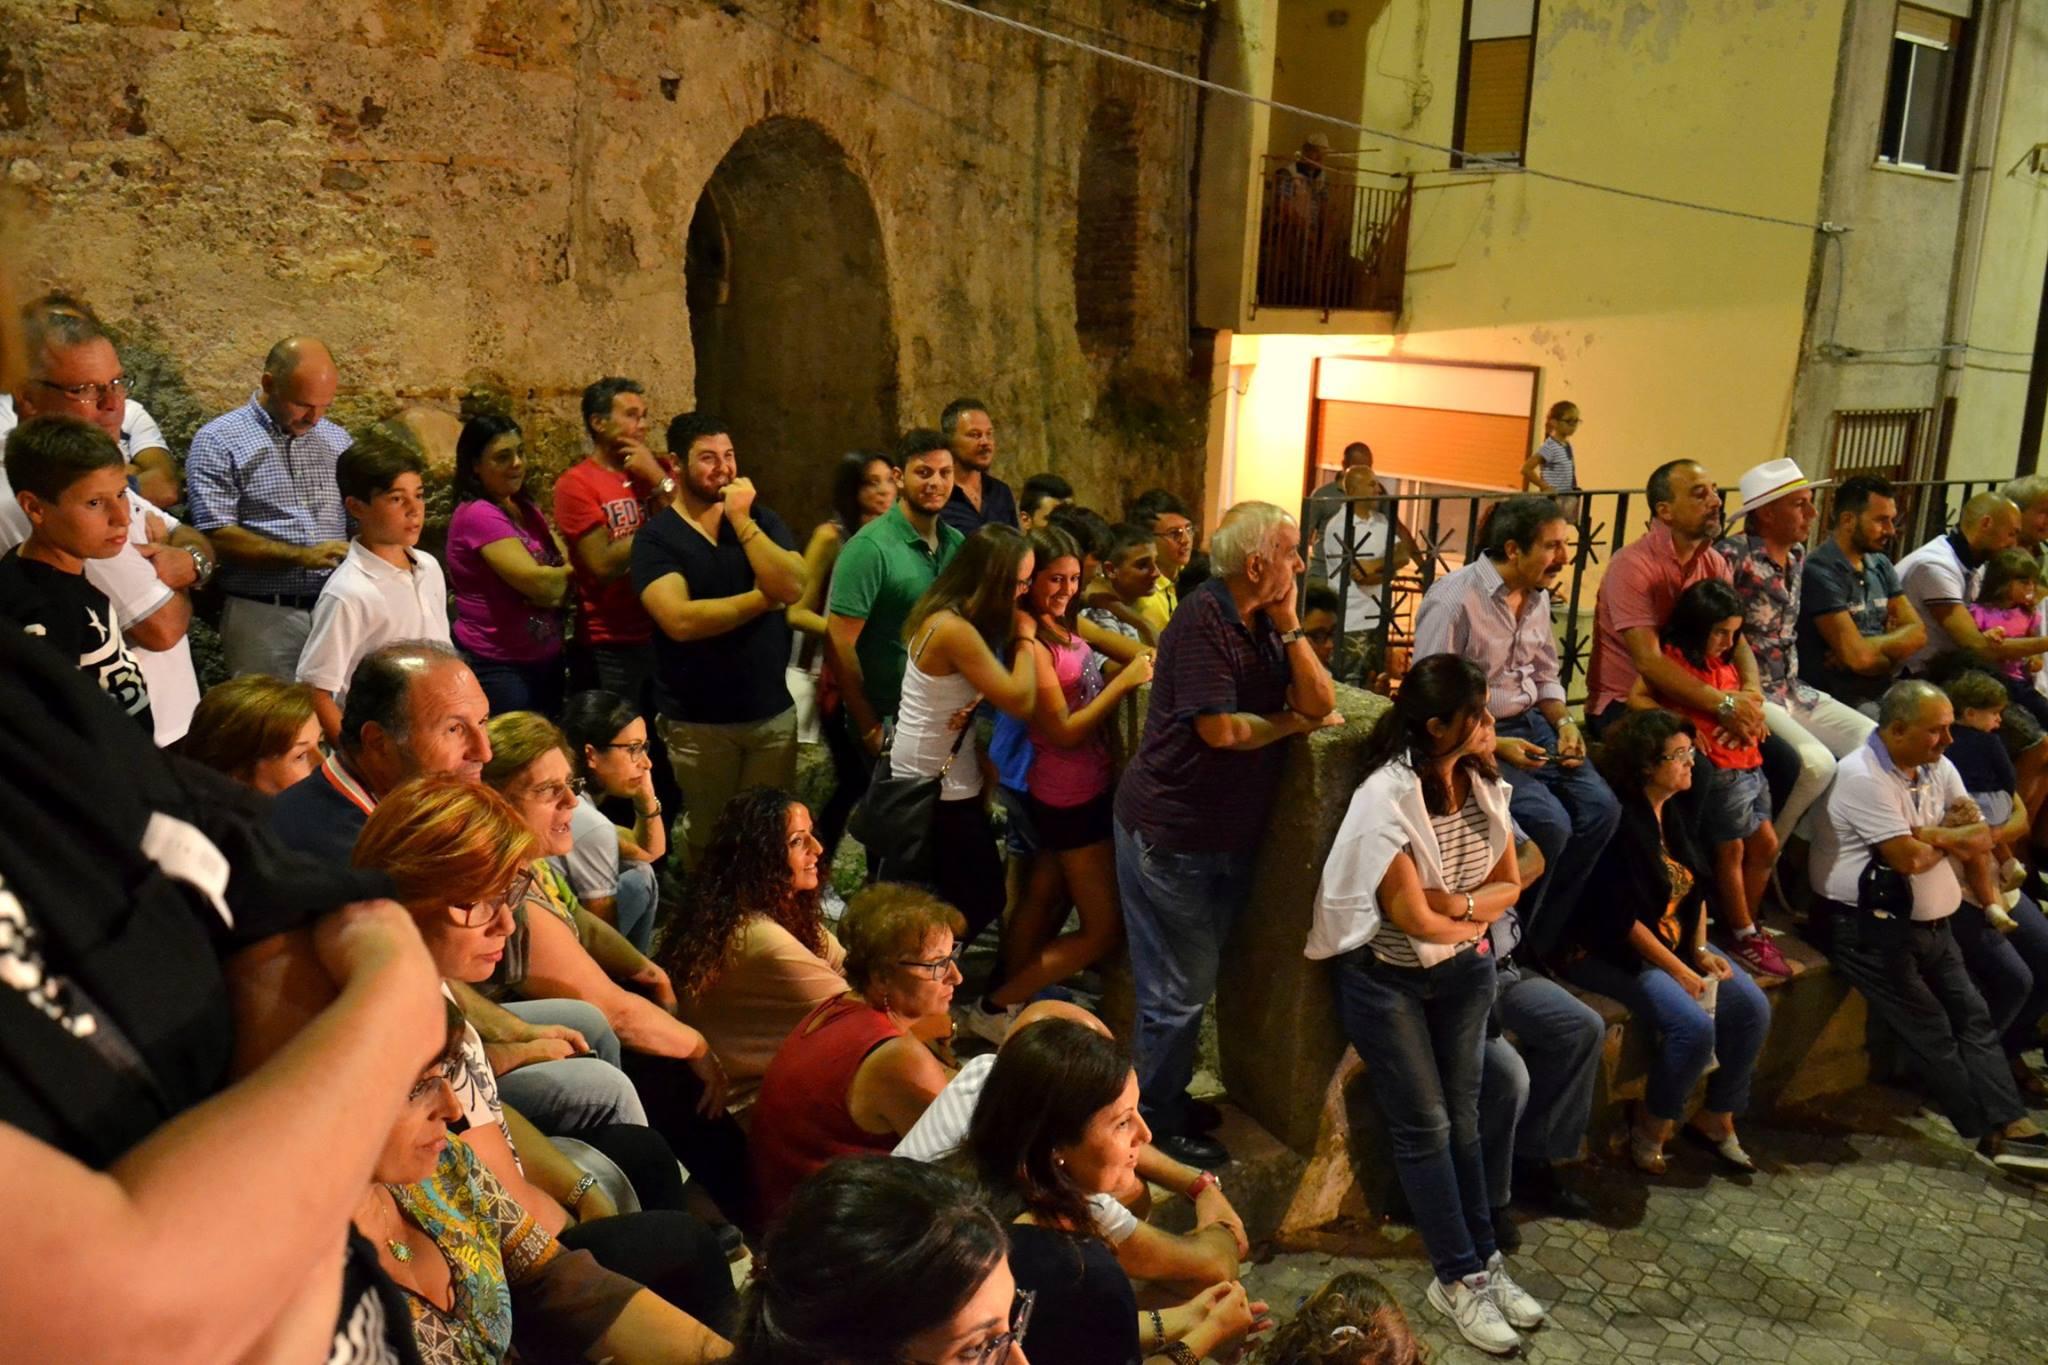 Copy of The crowd gathered in the piazza San Nicolò di Bari in Pezzolo